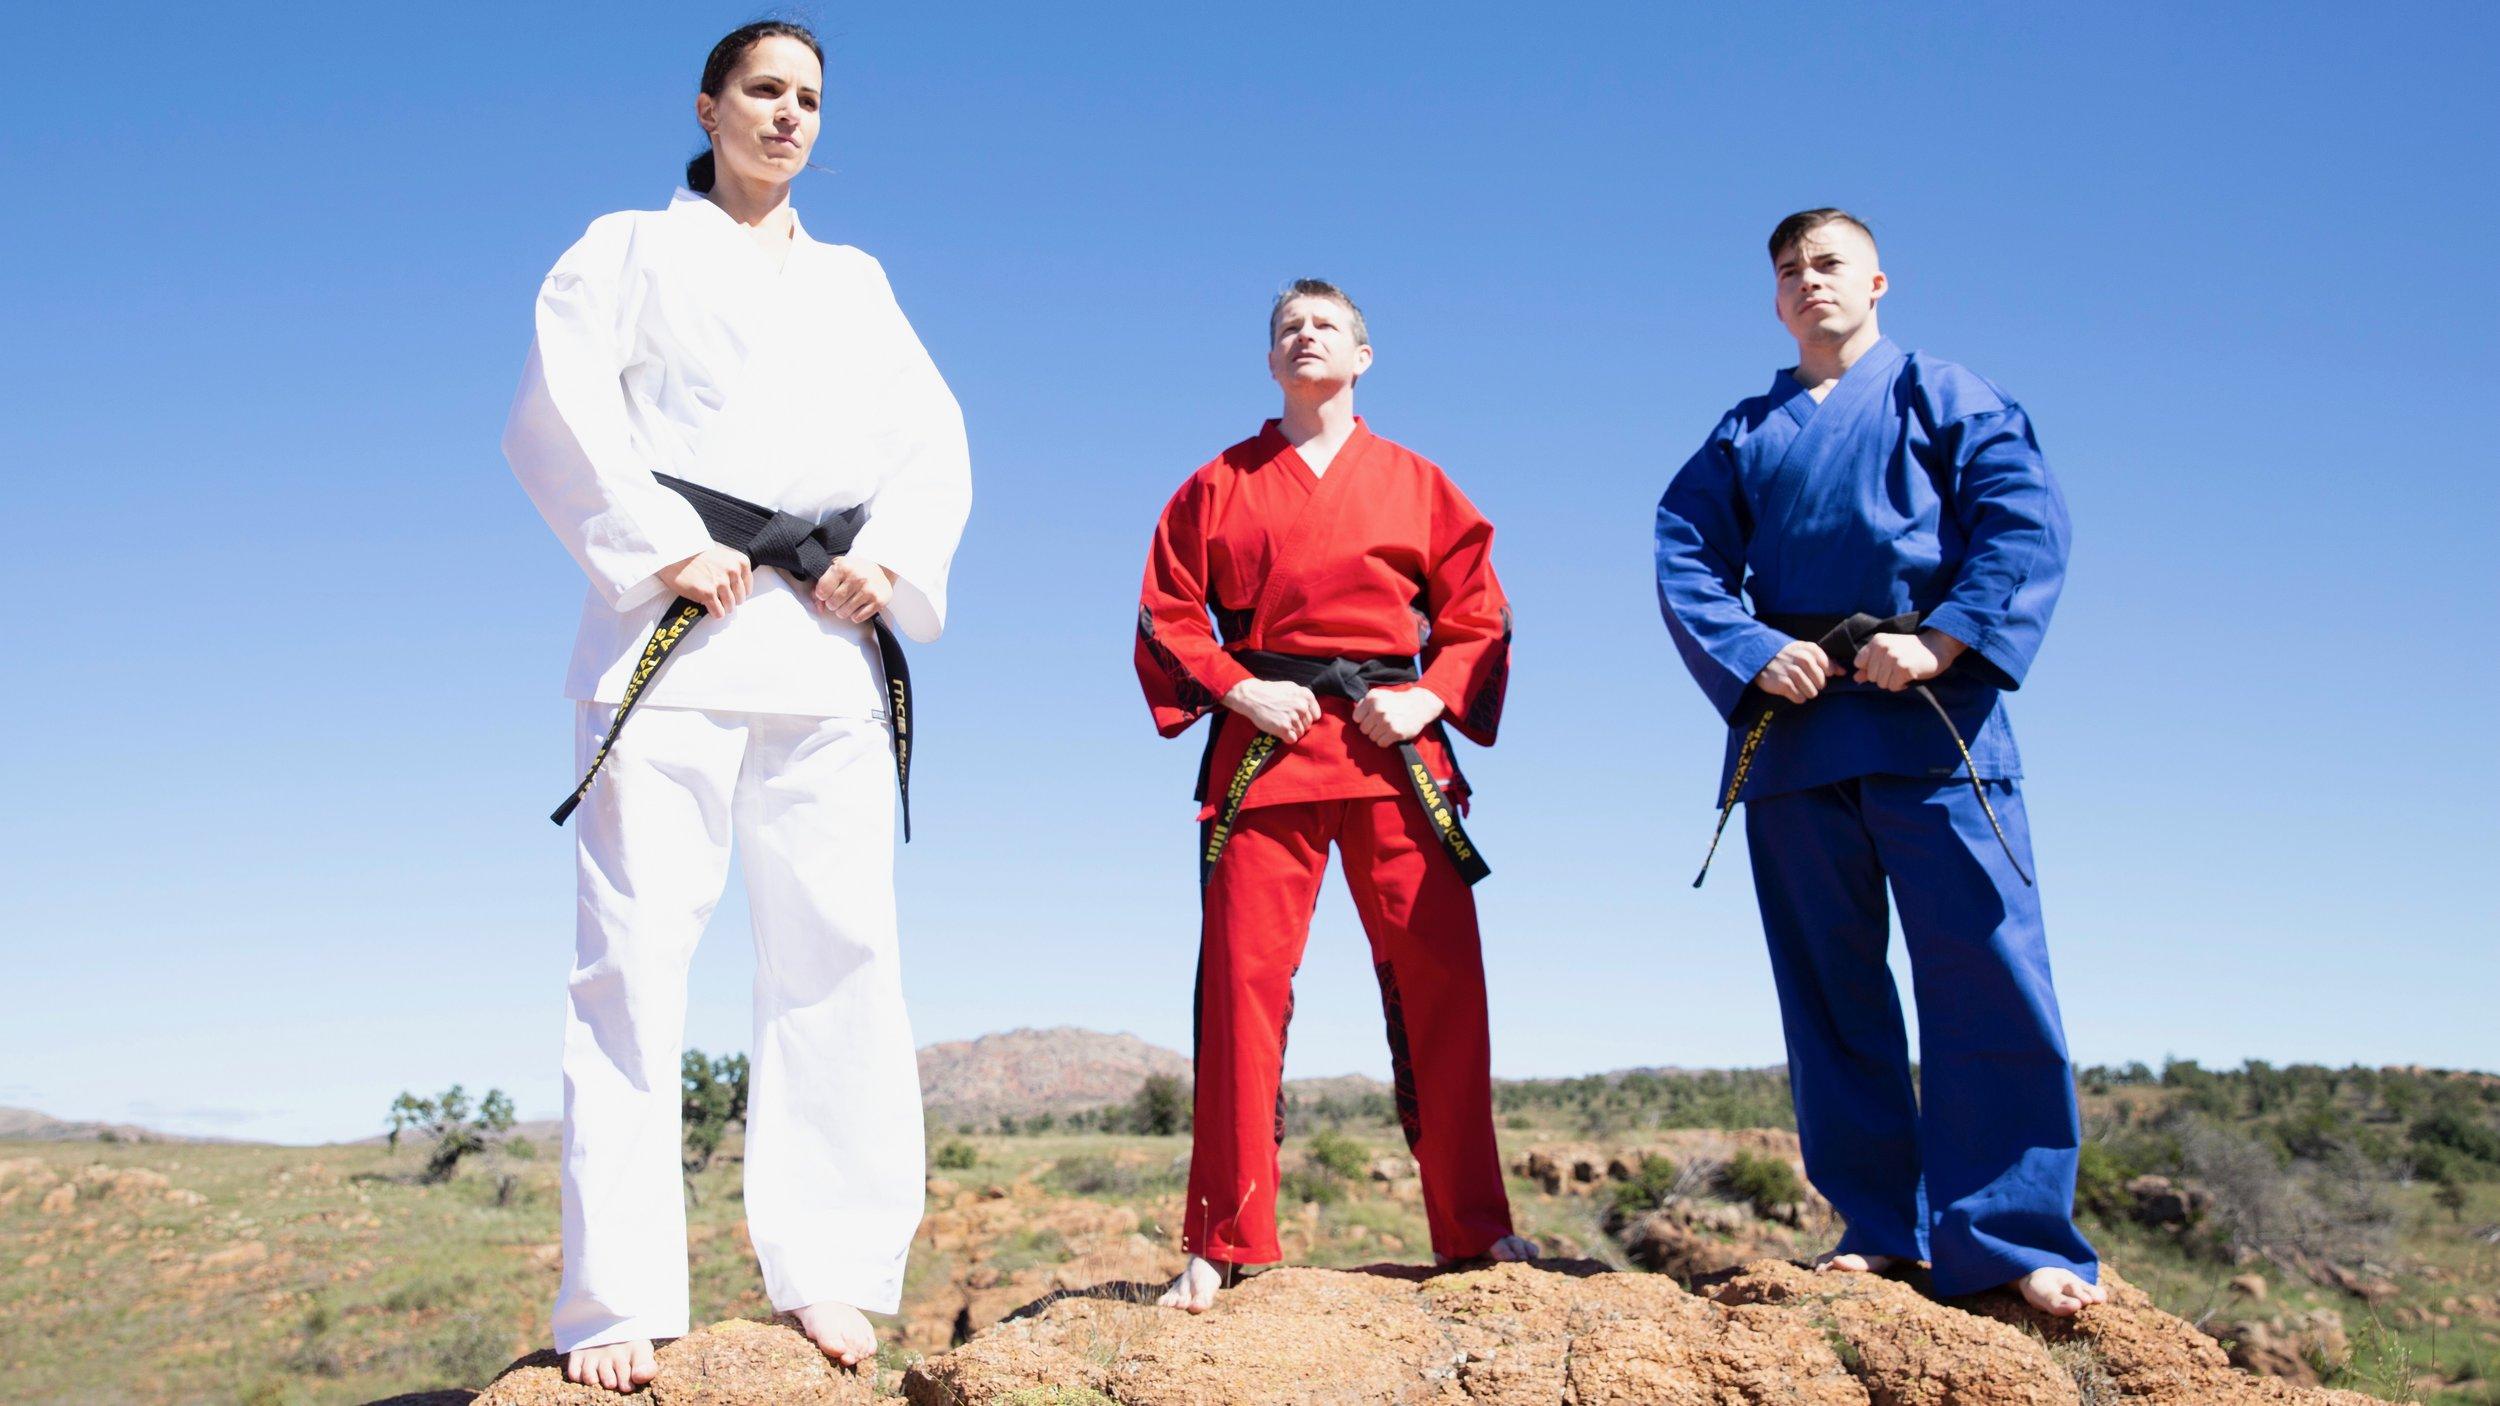 spicars-martial-arts-champions-gold-medals-southlake-texas.jpeg